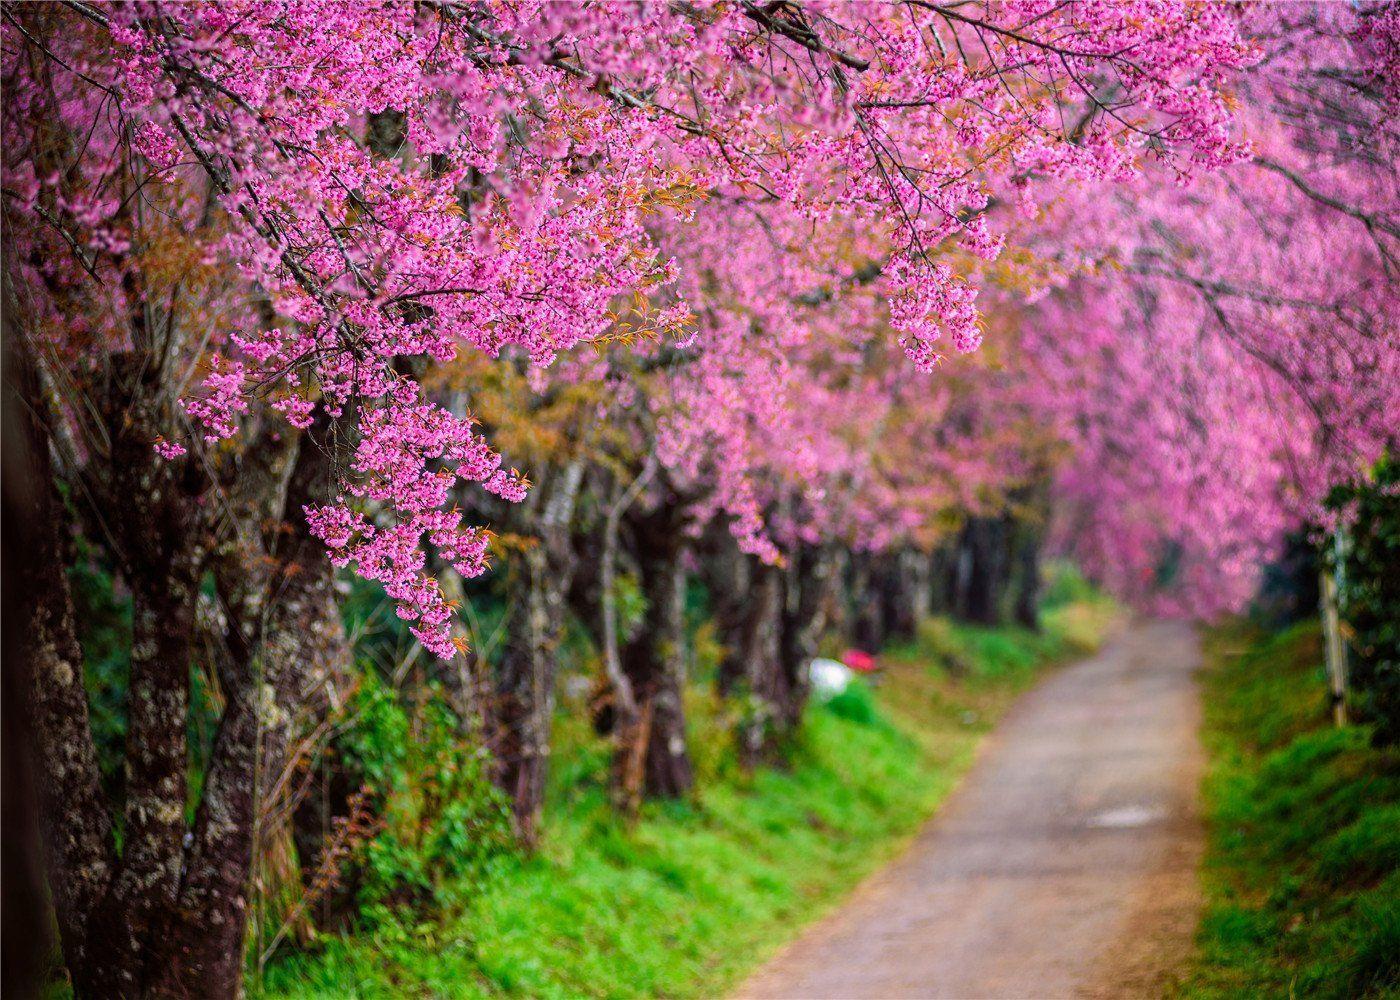 SUSU Natural Scenery Photography Backdrops